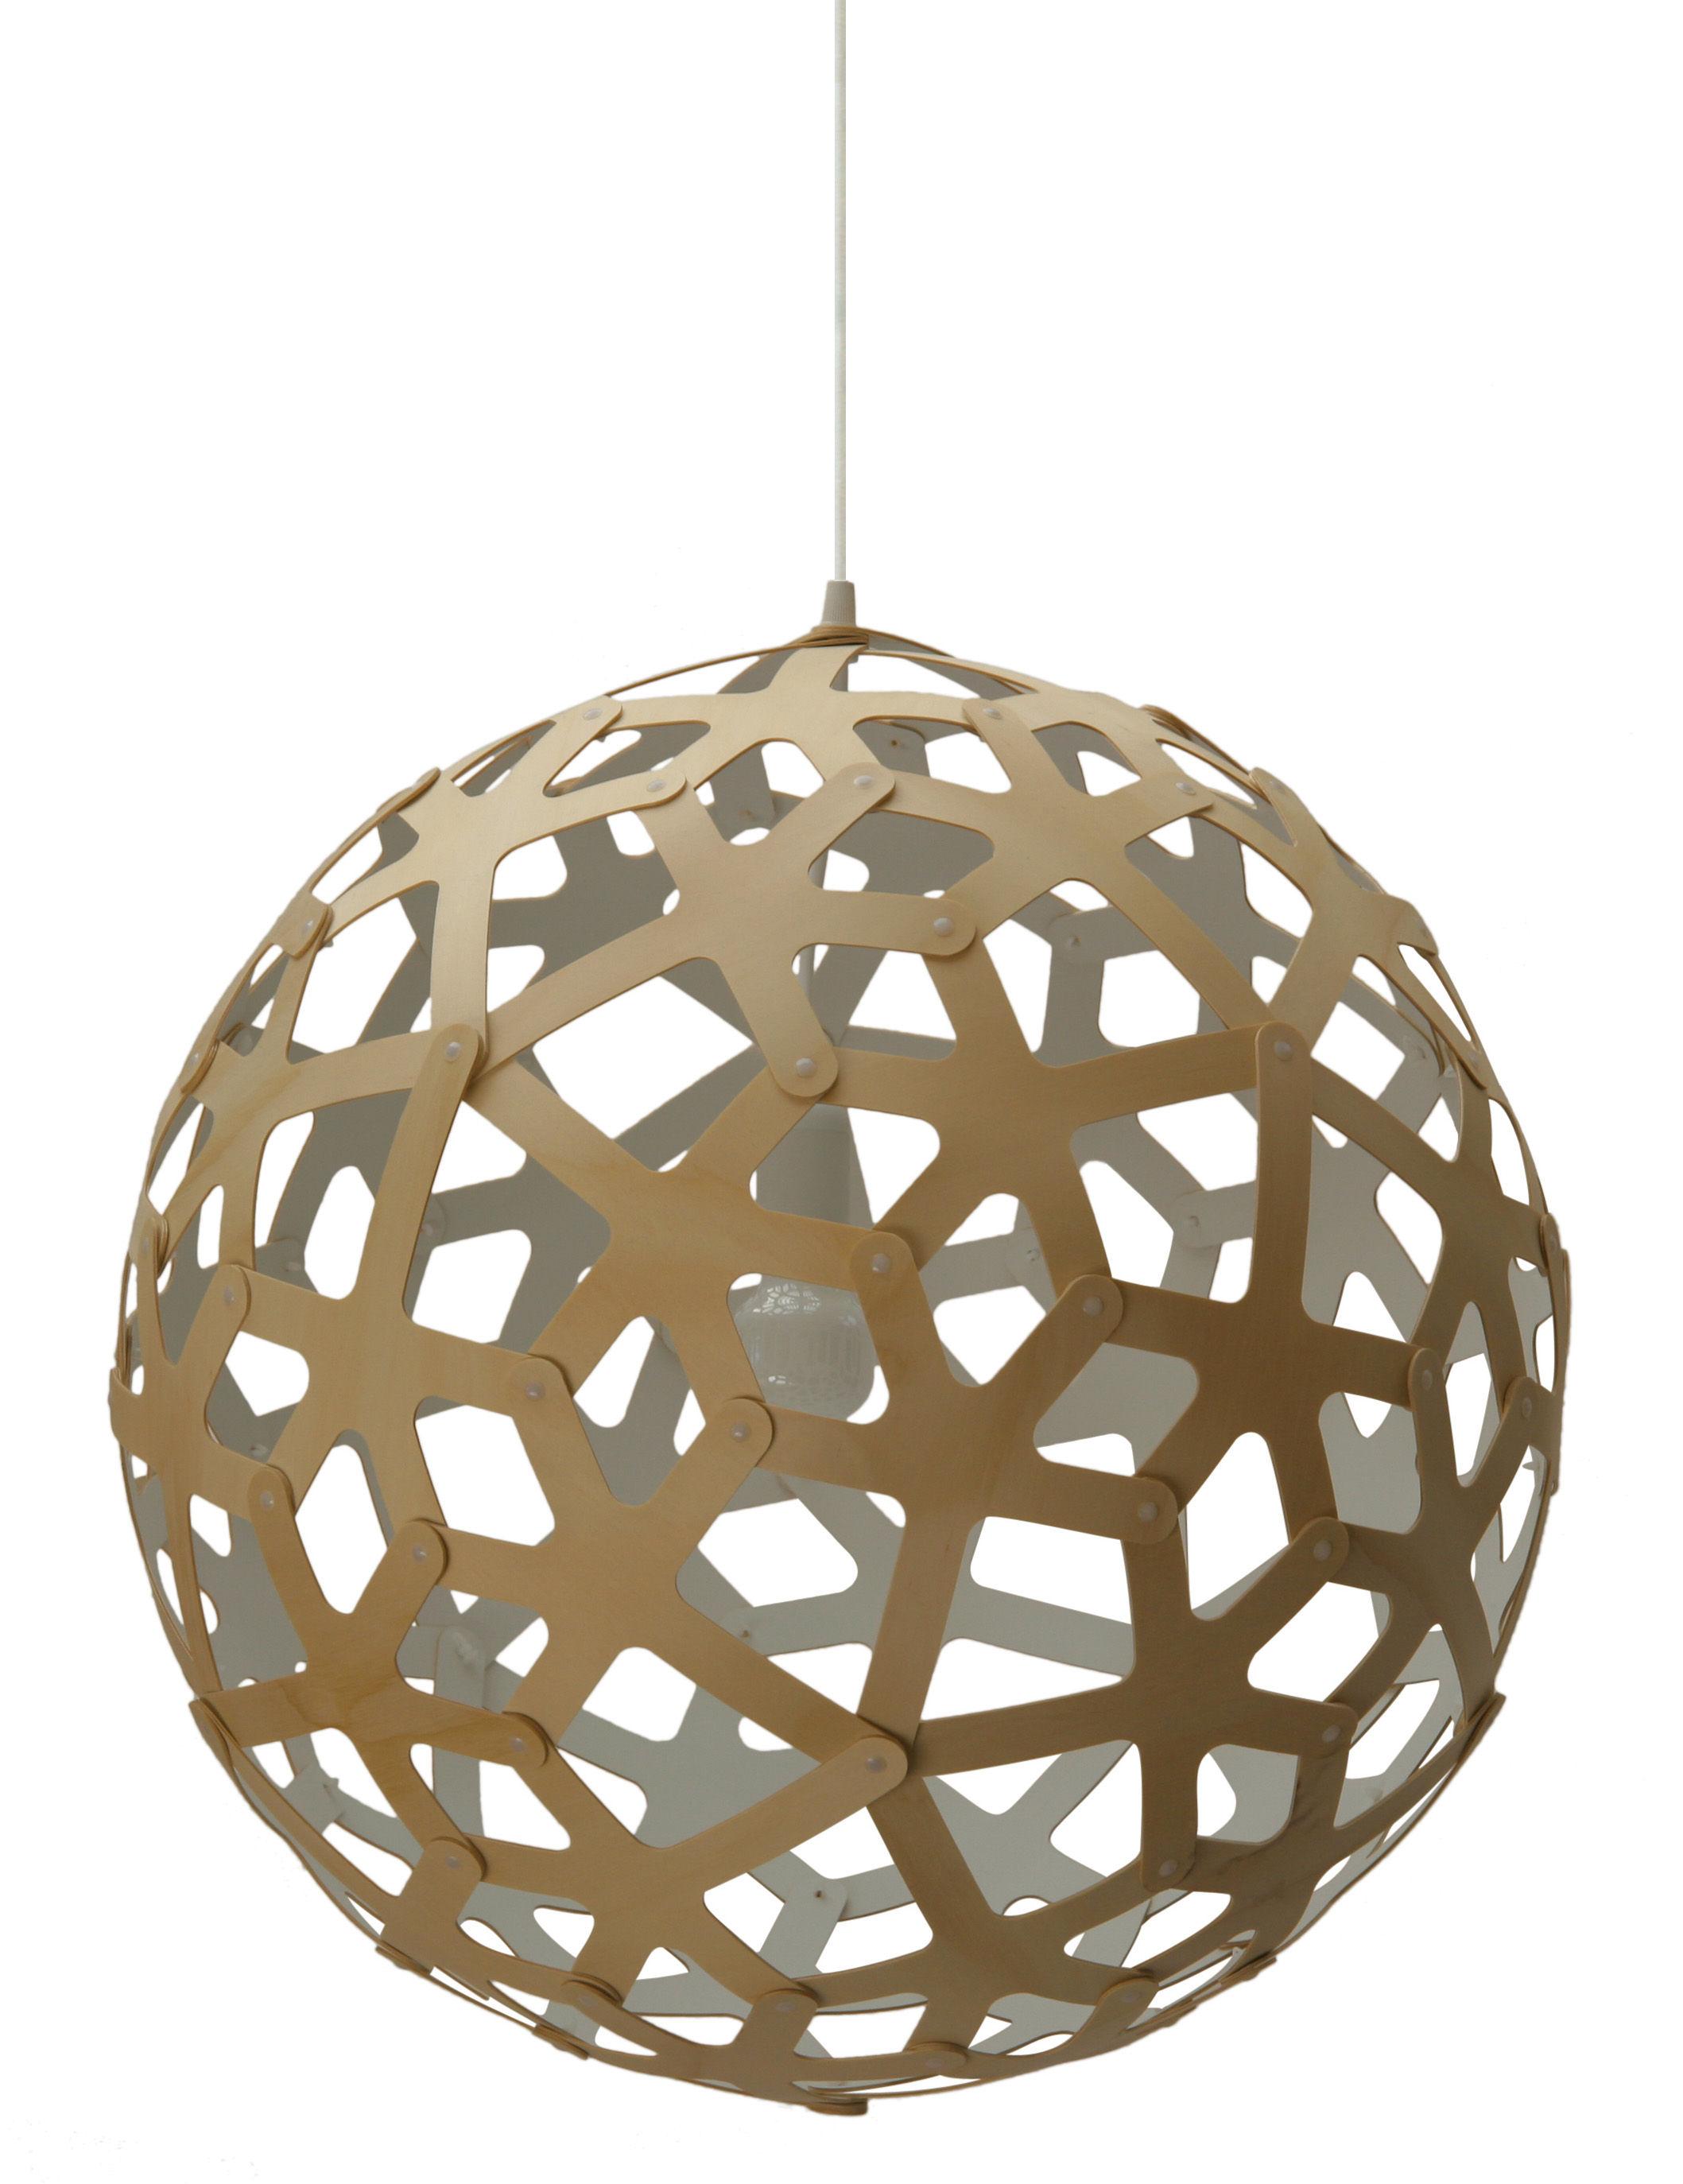 Lighting - Pendant Lighting - Coral Pendant - / Ø 40 cm - Bicoloured by David Trubridge - White / Natural wood - Pine